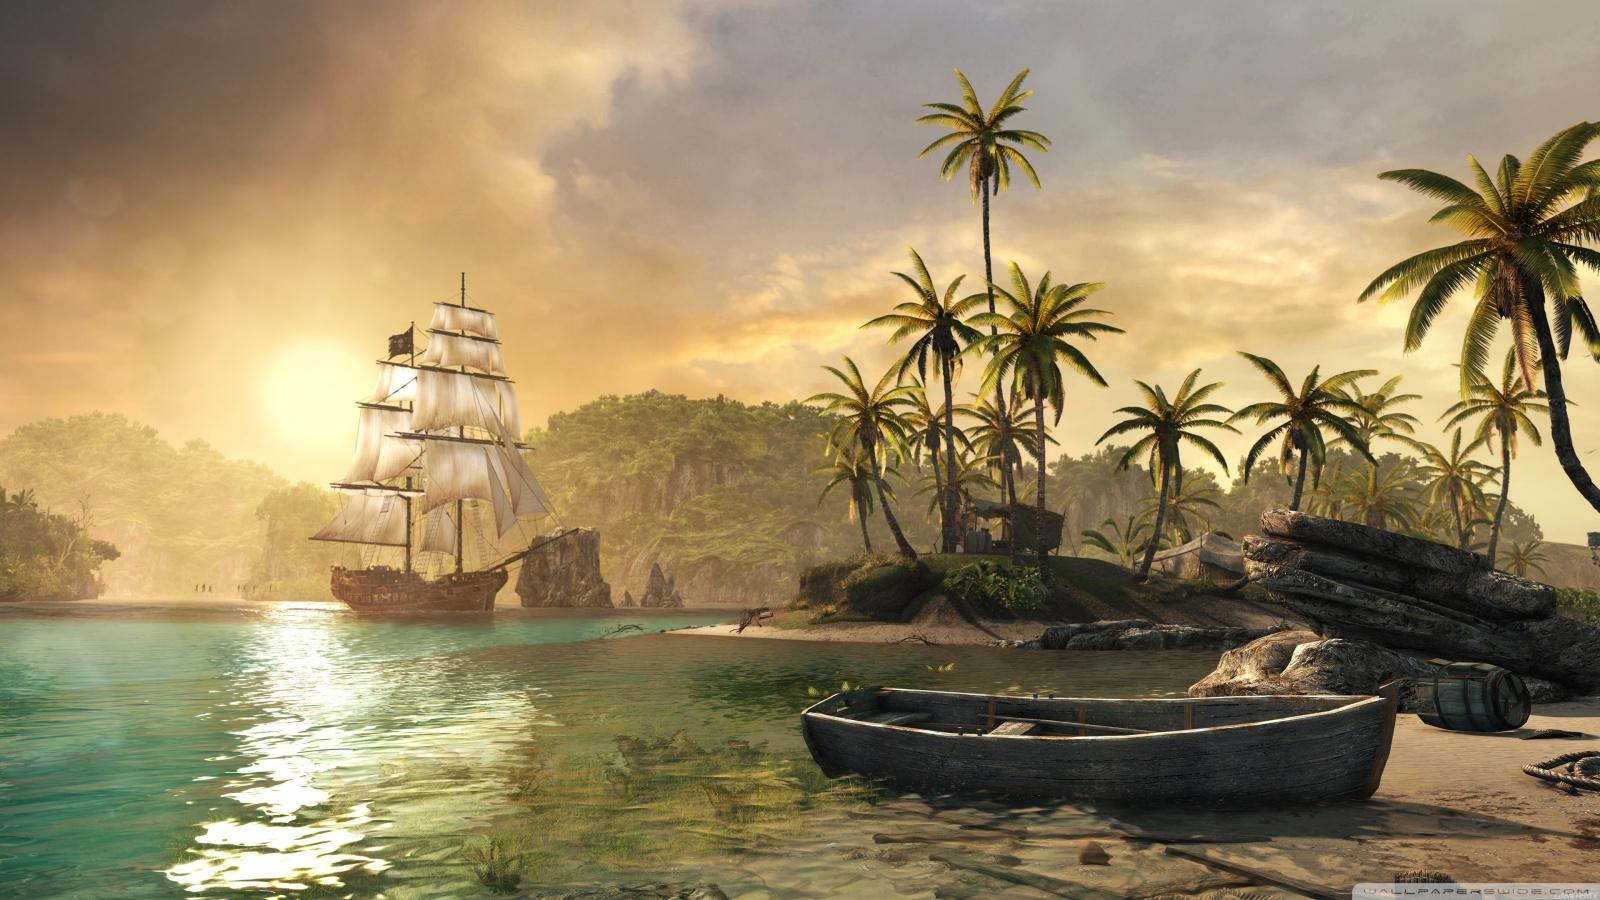 Free Assassins Creed IV Black Flag phone wallpaper by kvnwhitten